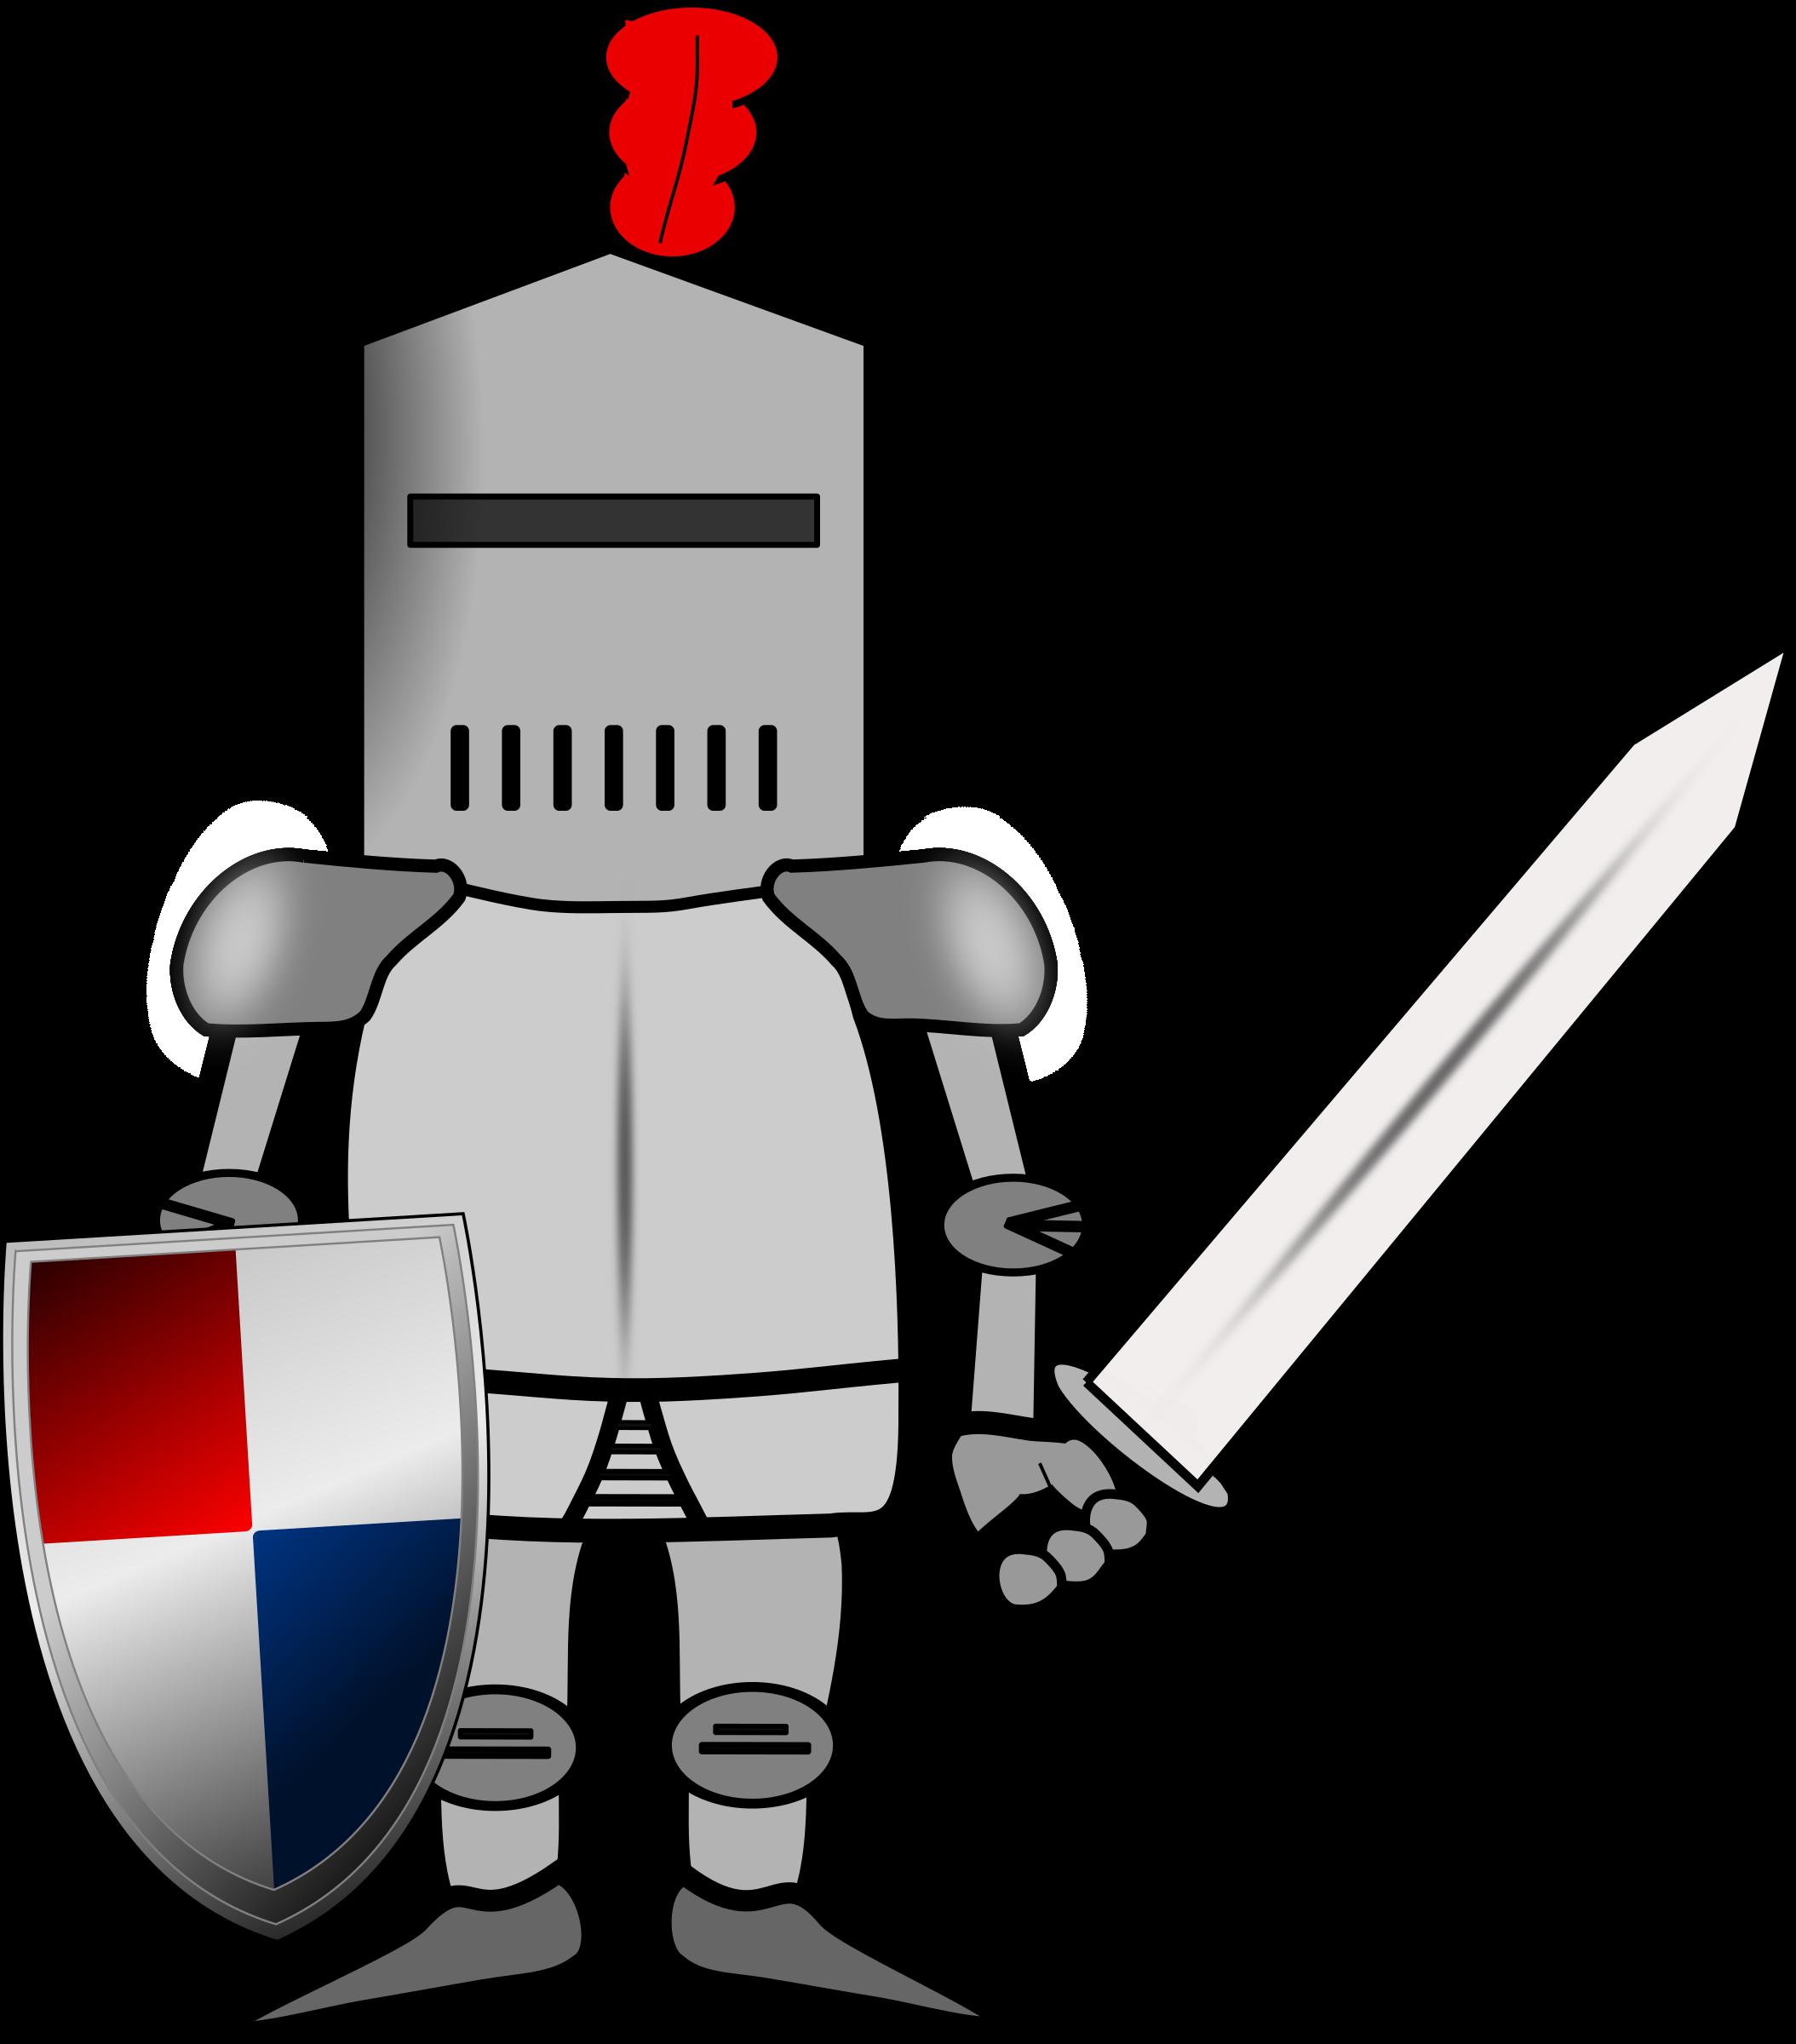 knight-clipart-1